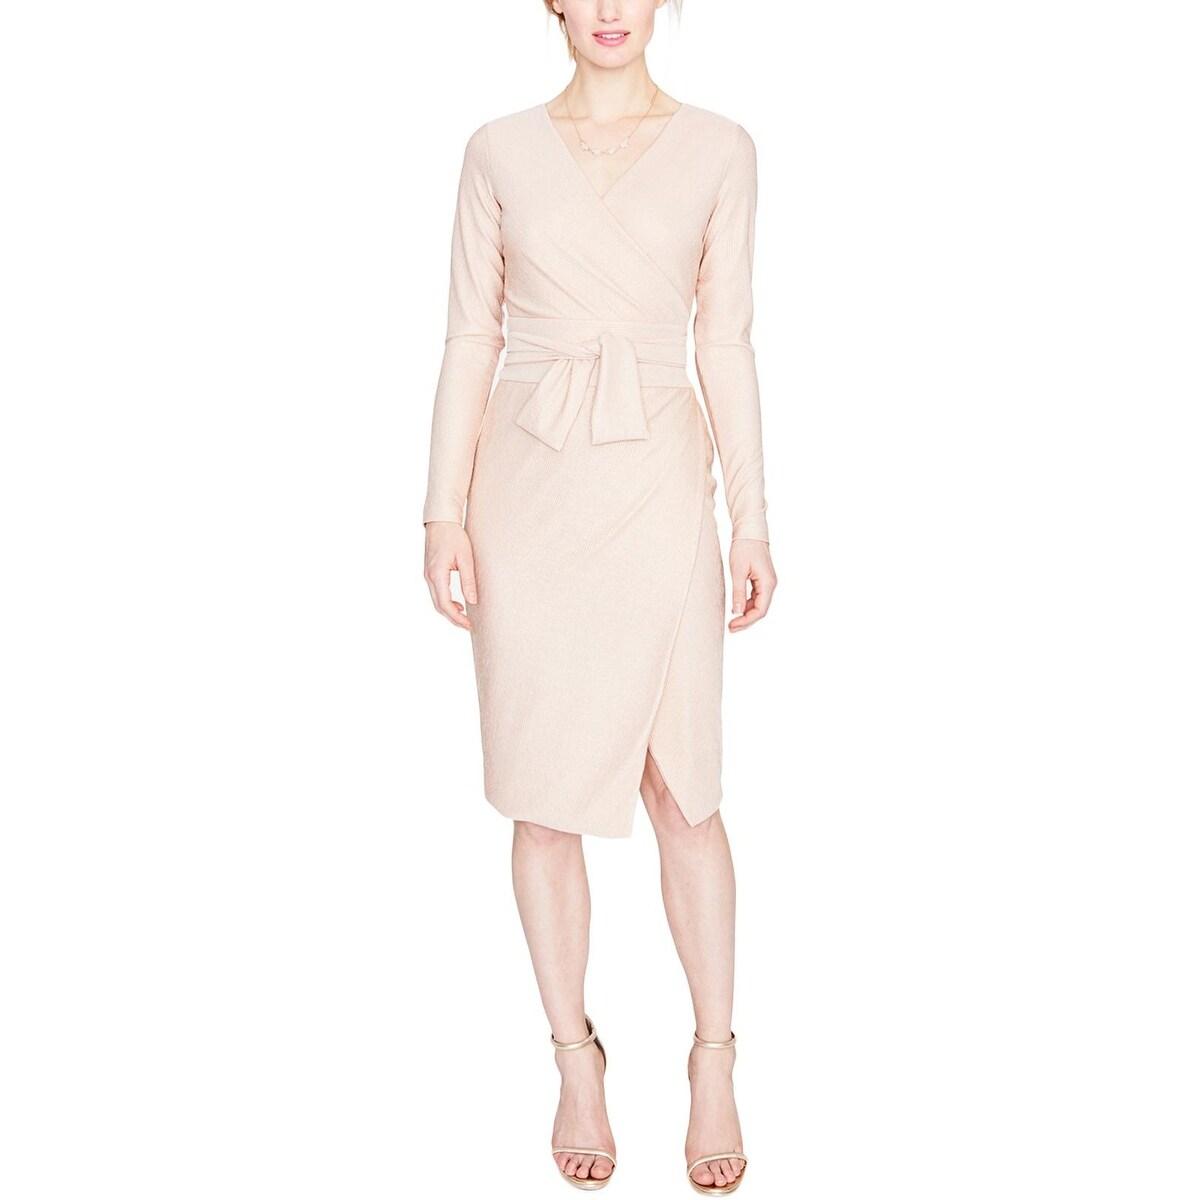 71ba93c8155 Black And White Striped Dress Dillards